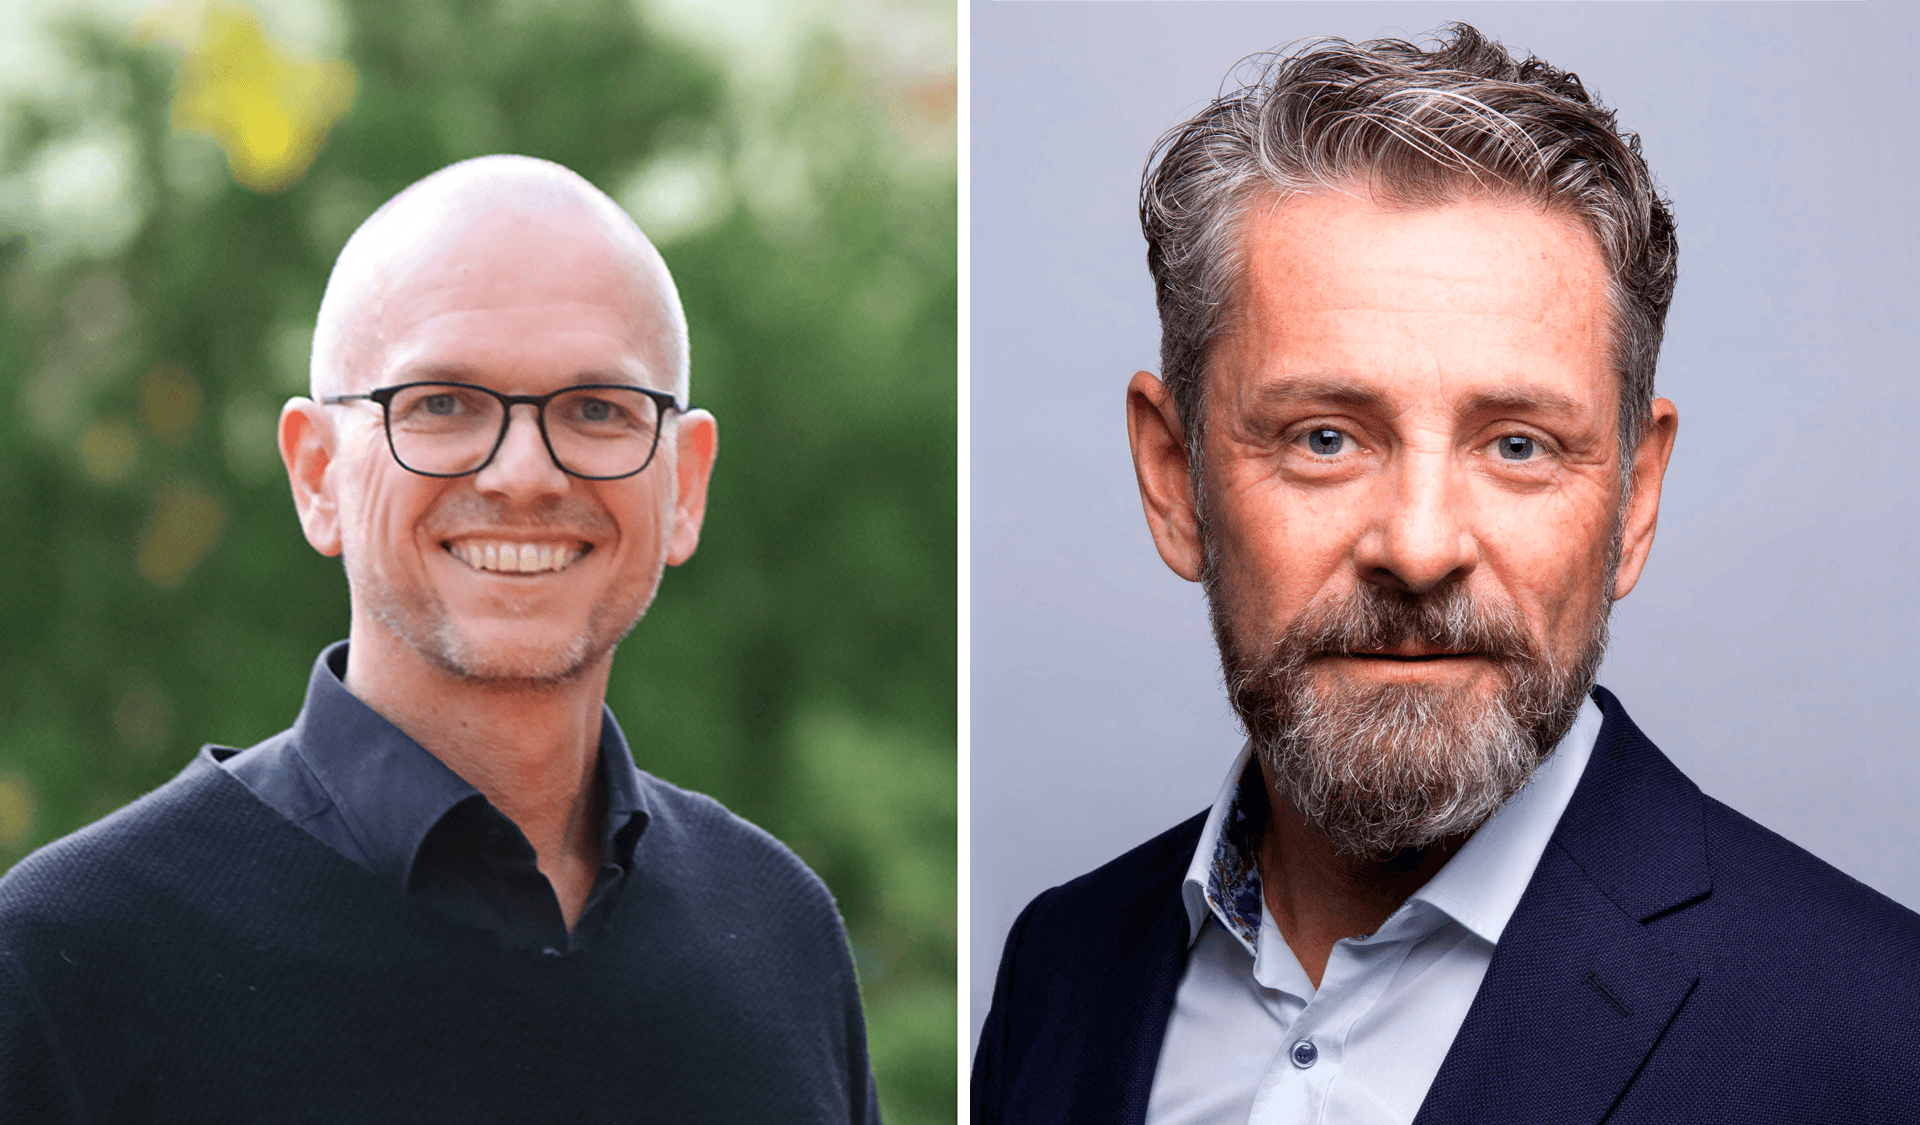 Alexander Gerber und Andreas Schopper